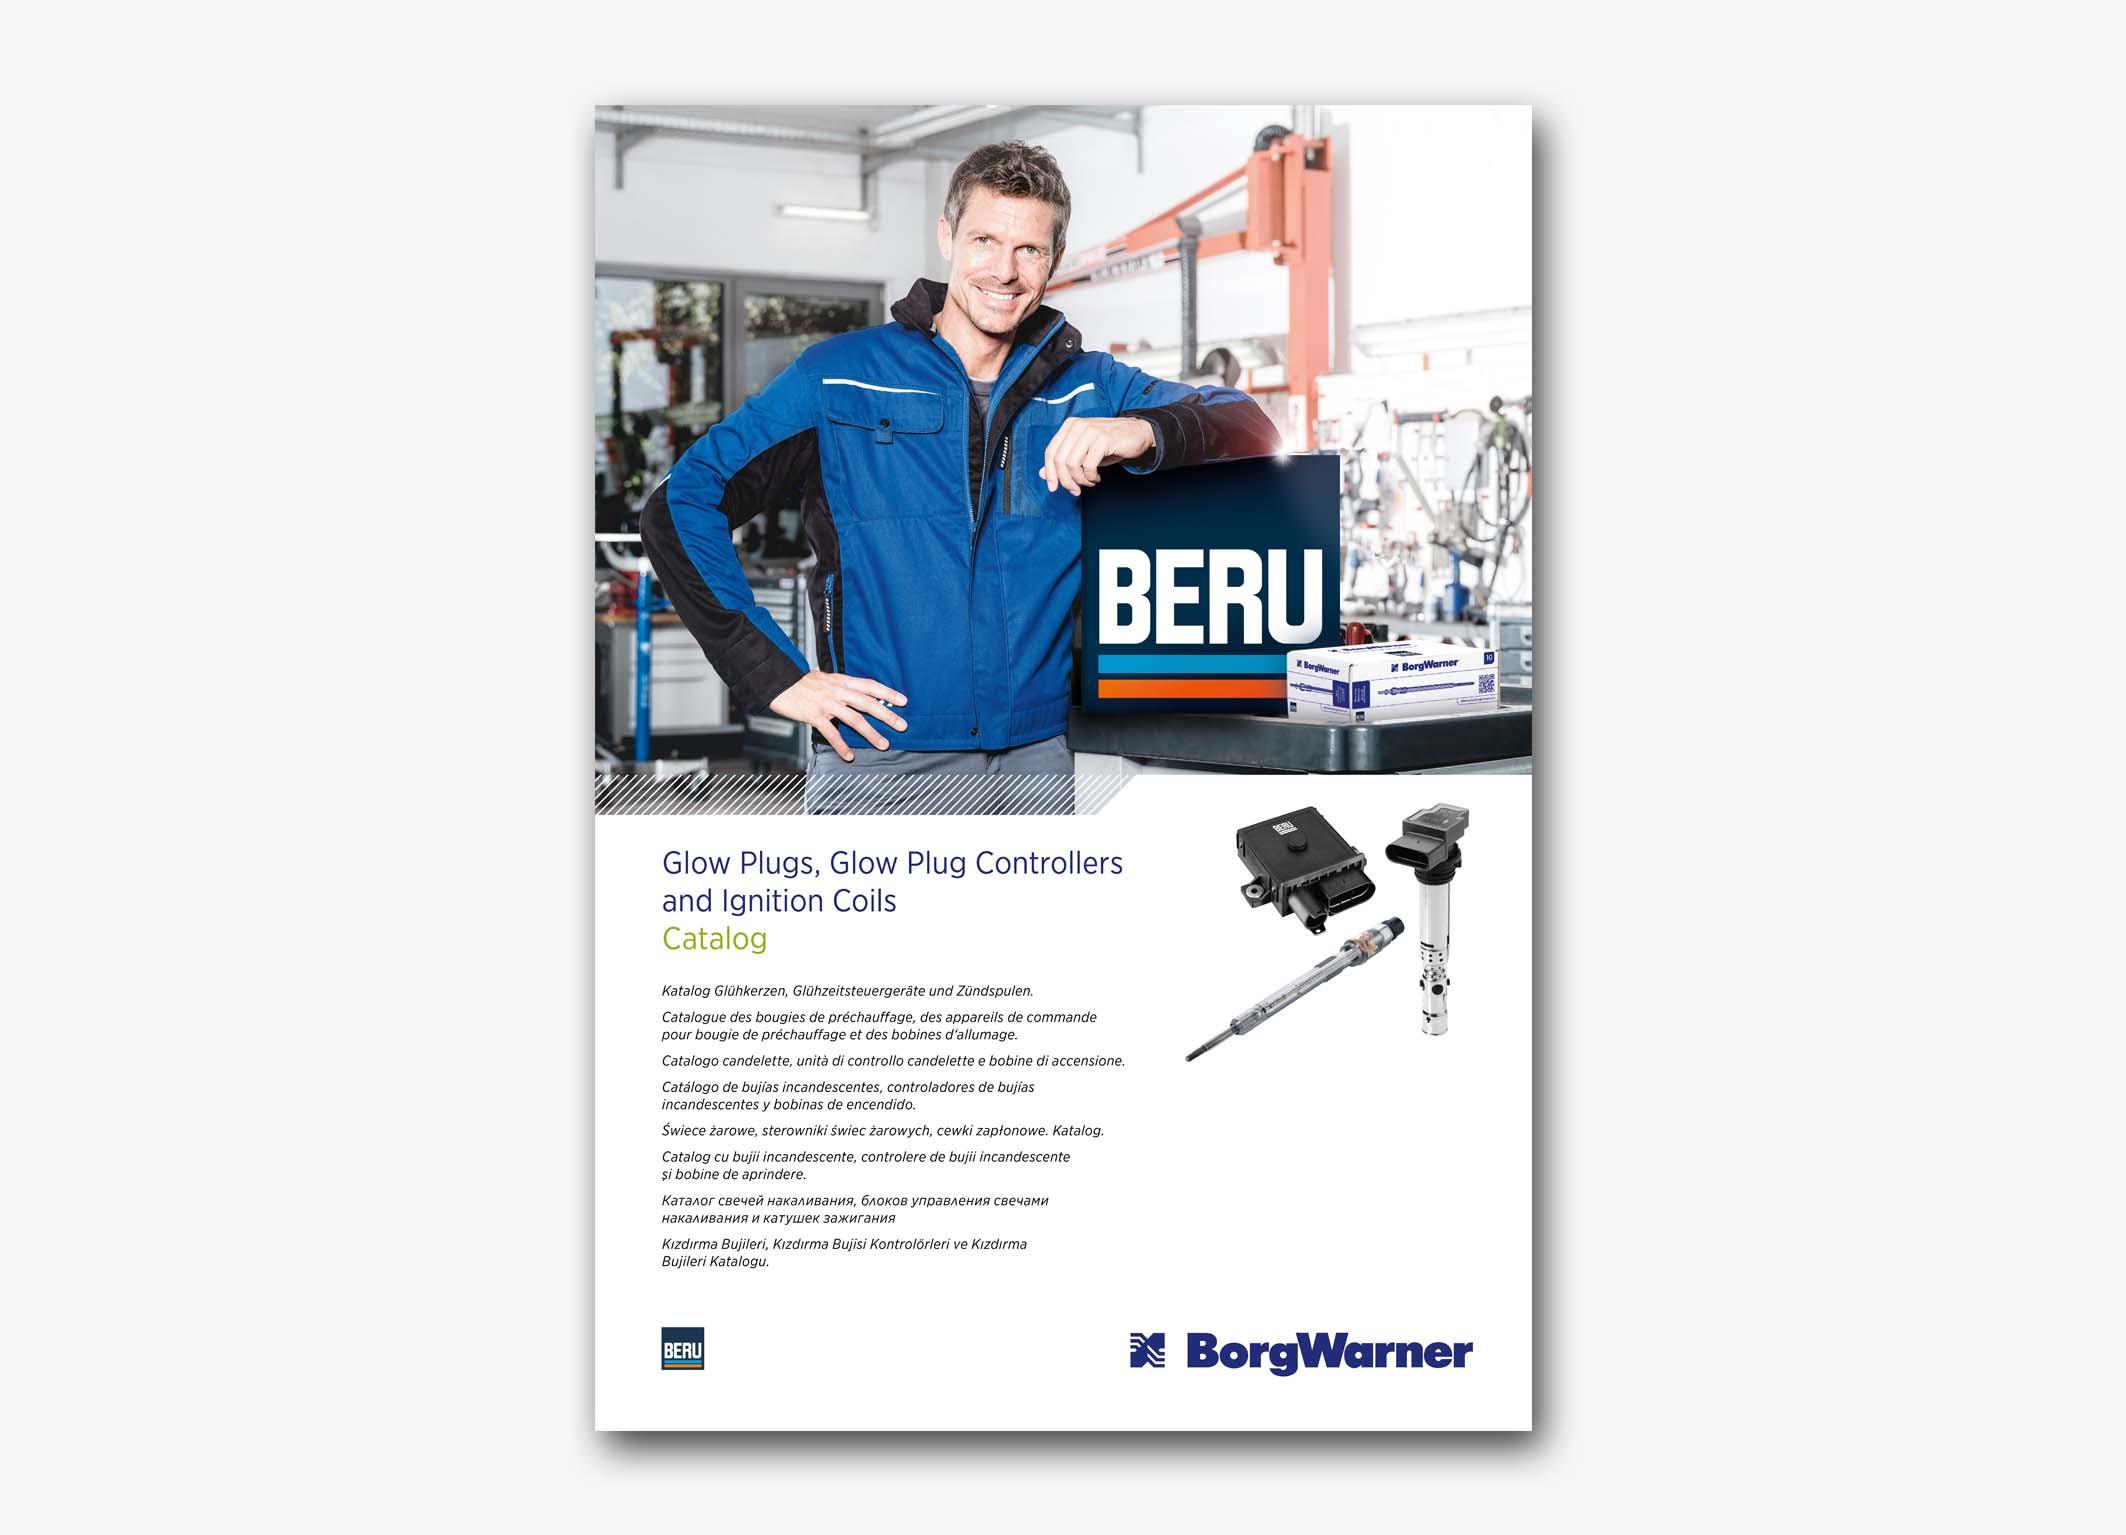 BERU Catalog